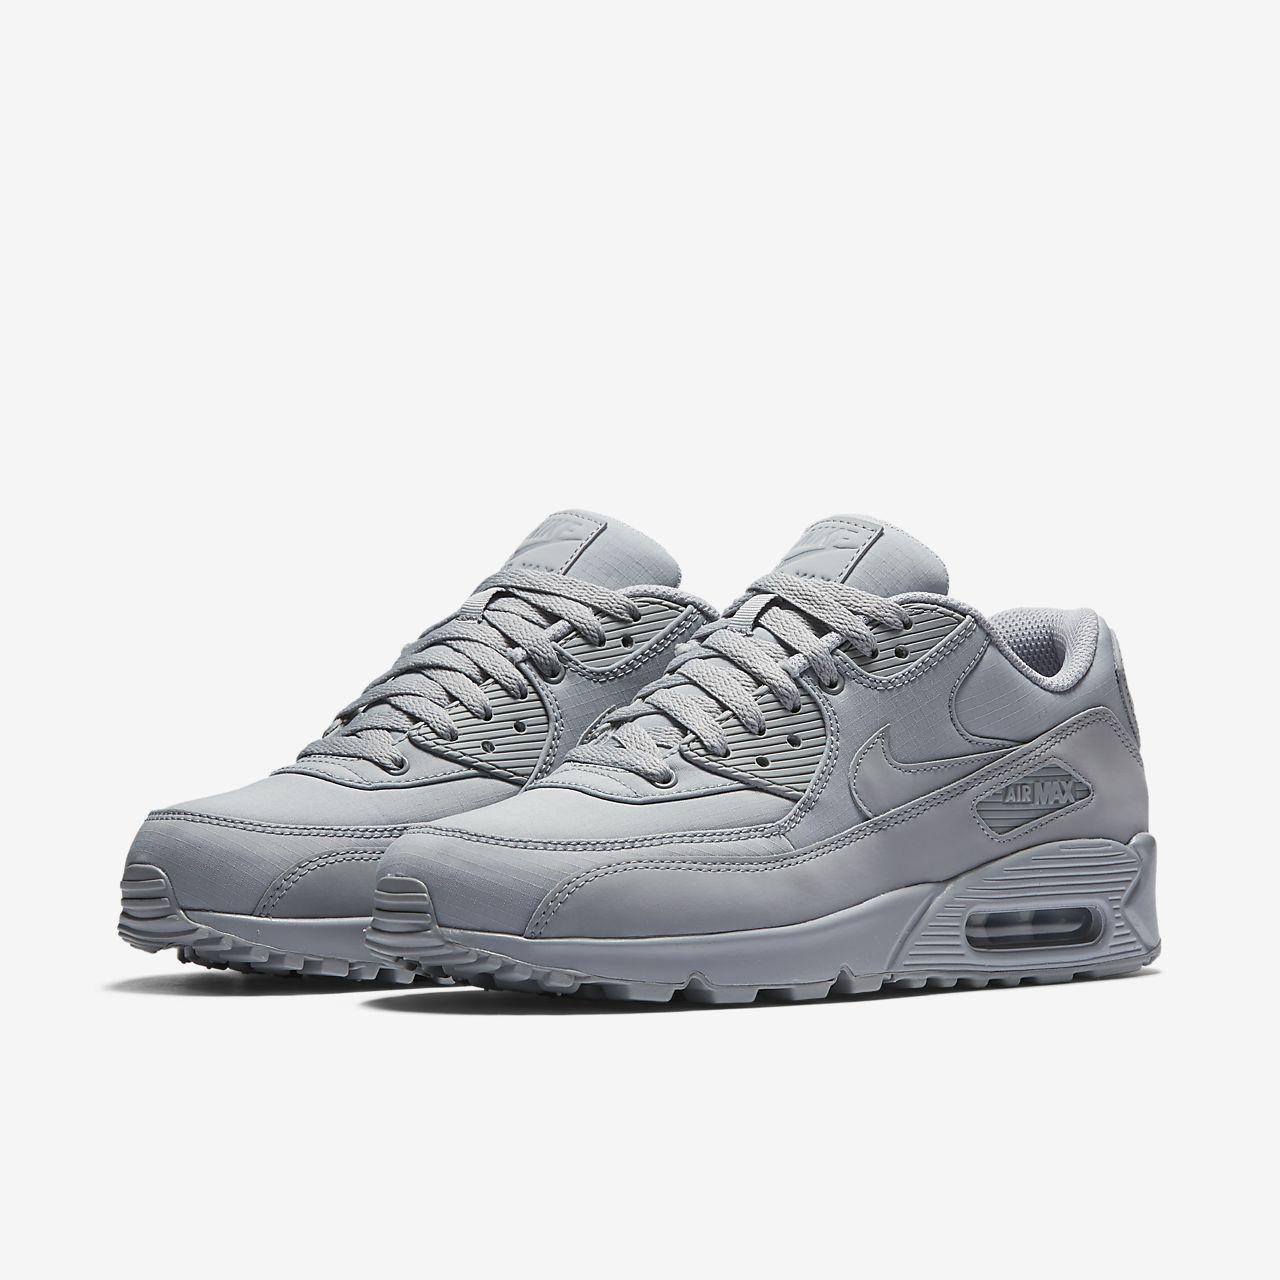 separation shoes 9d606 491db ... Nike Air Max 90 Essential Men s Shoe